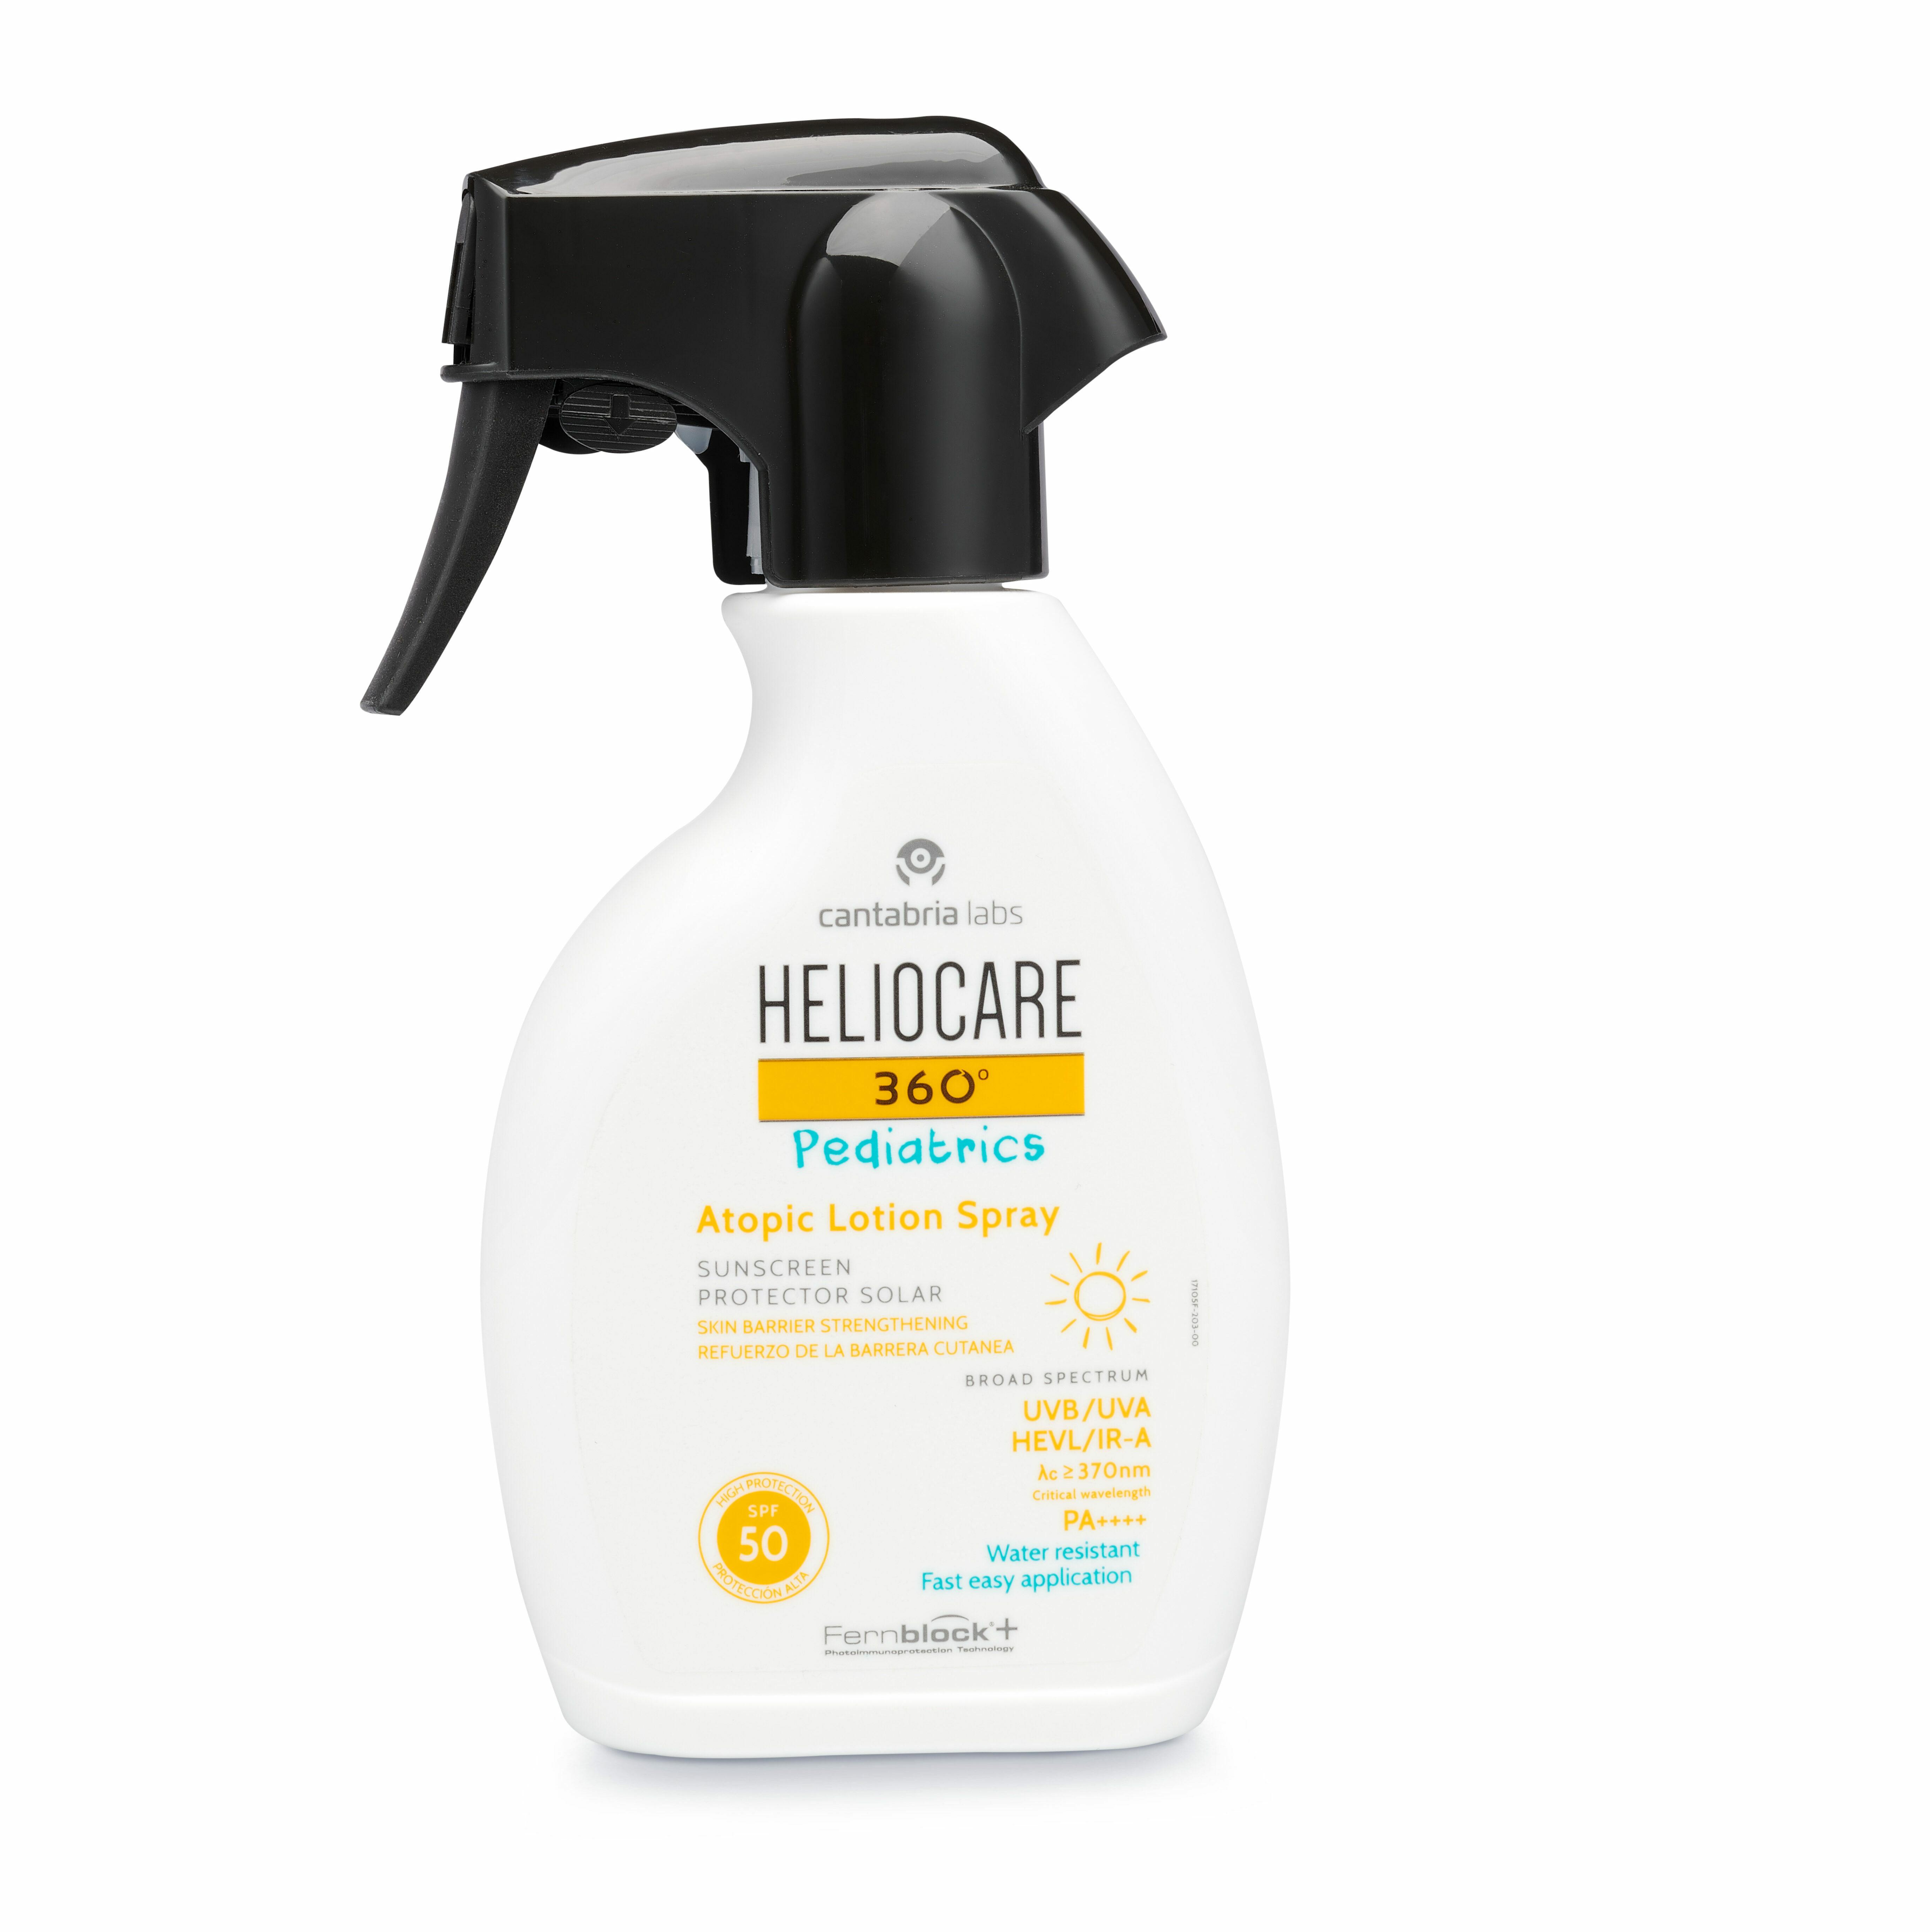 Heliocare 360º Pediatrics Atopic Lotion Spray SPF 50